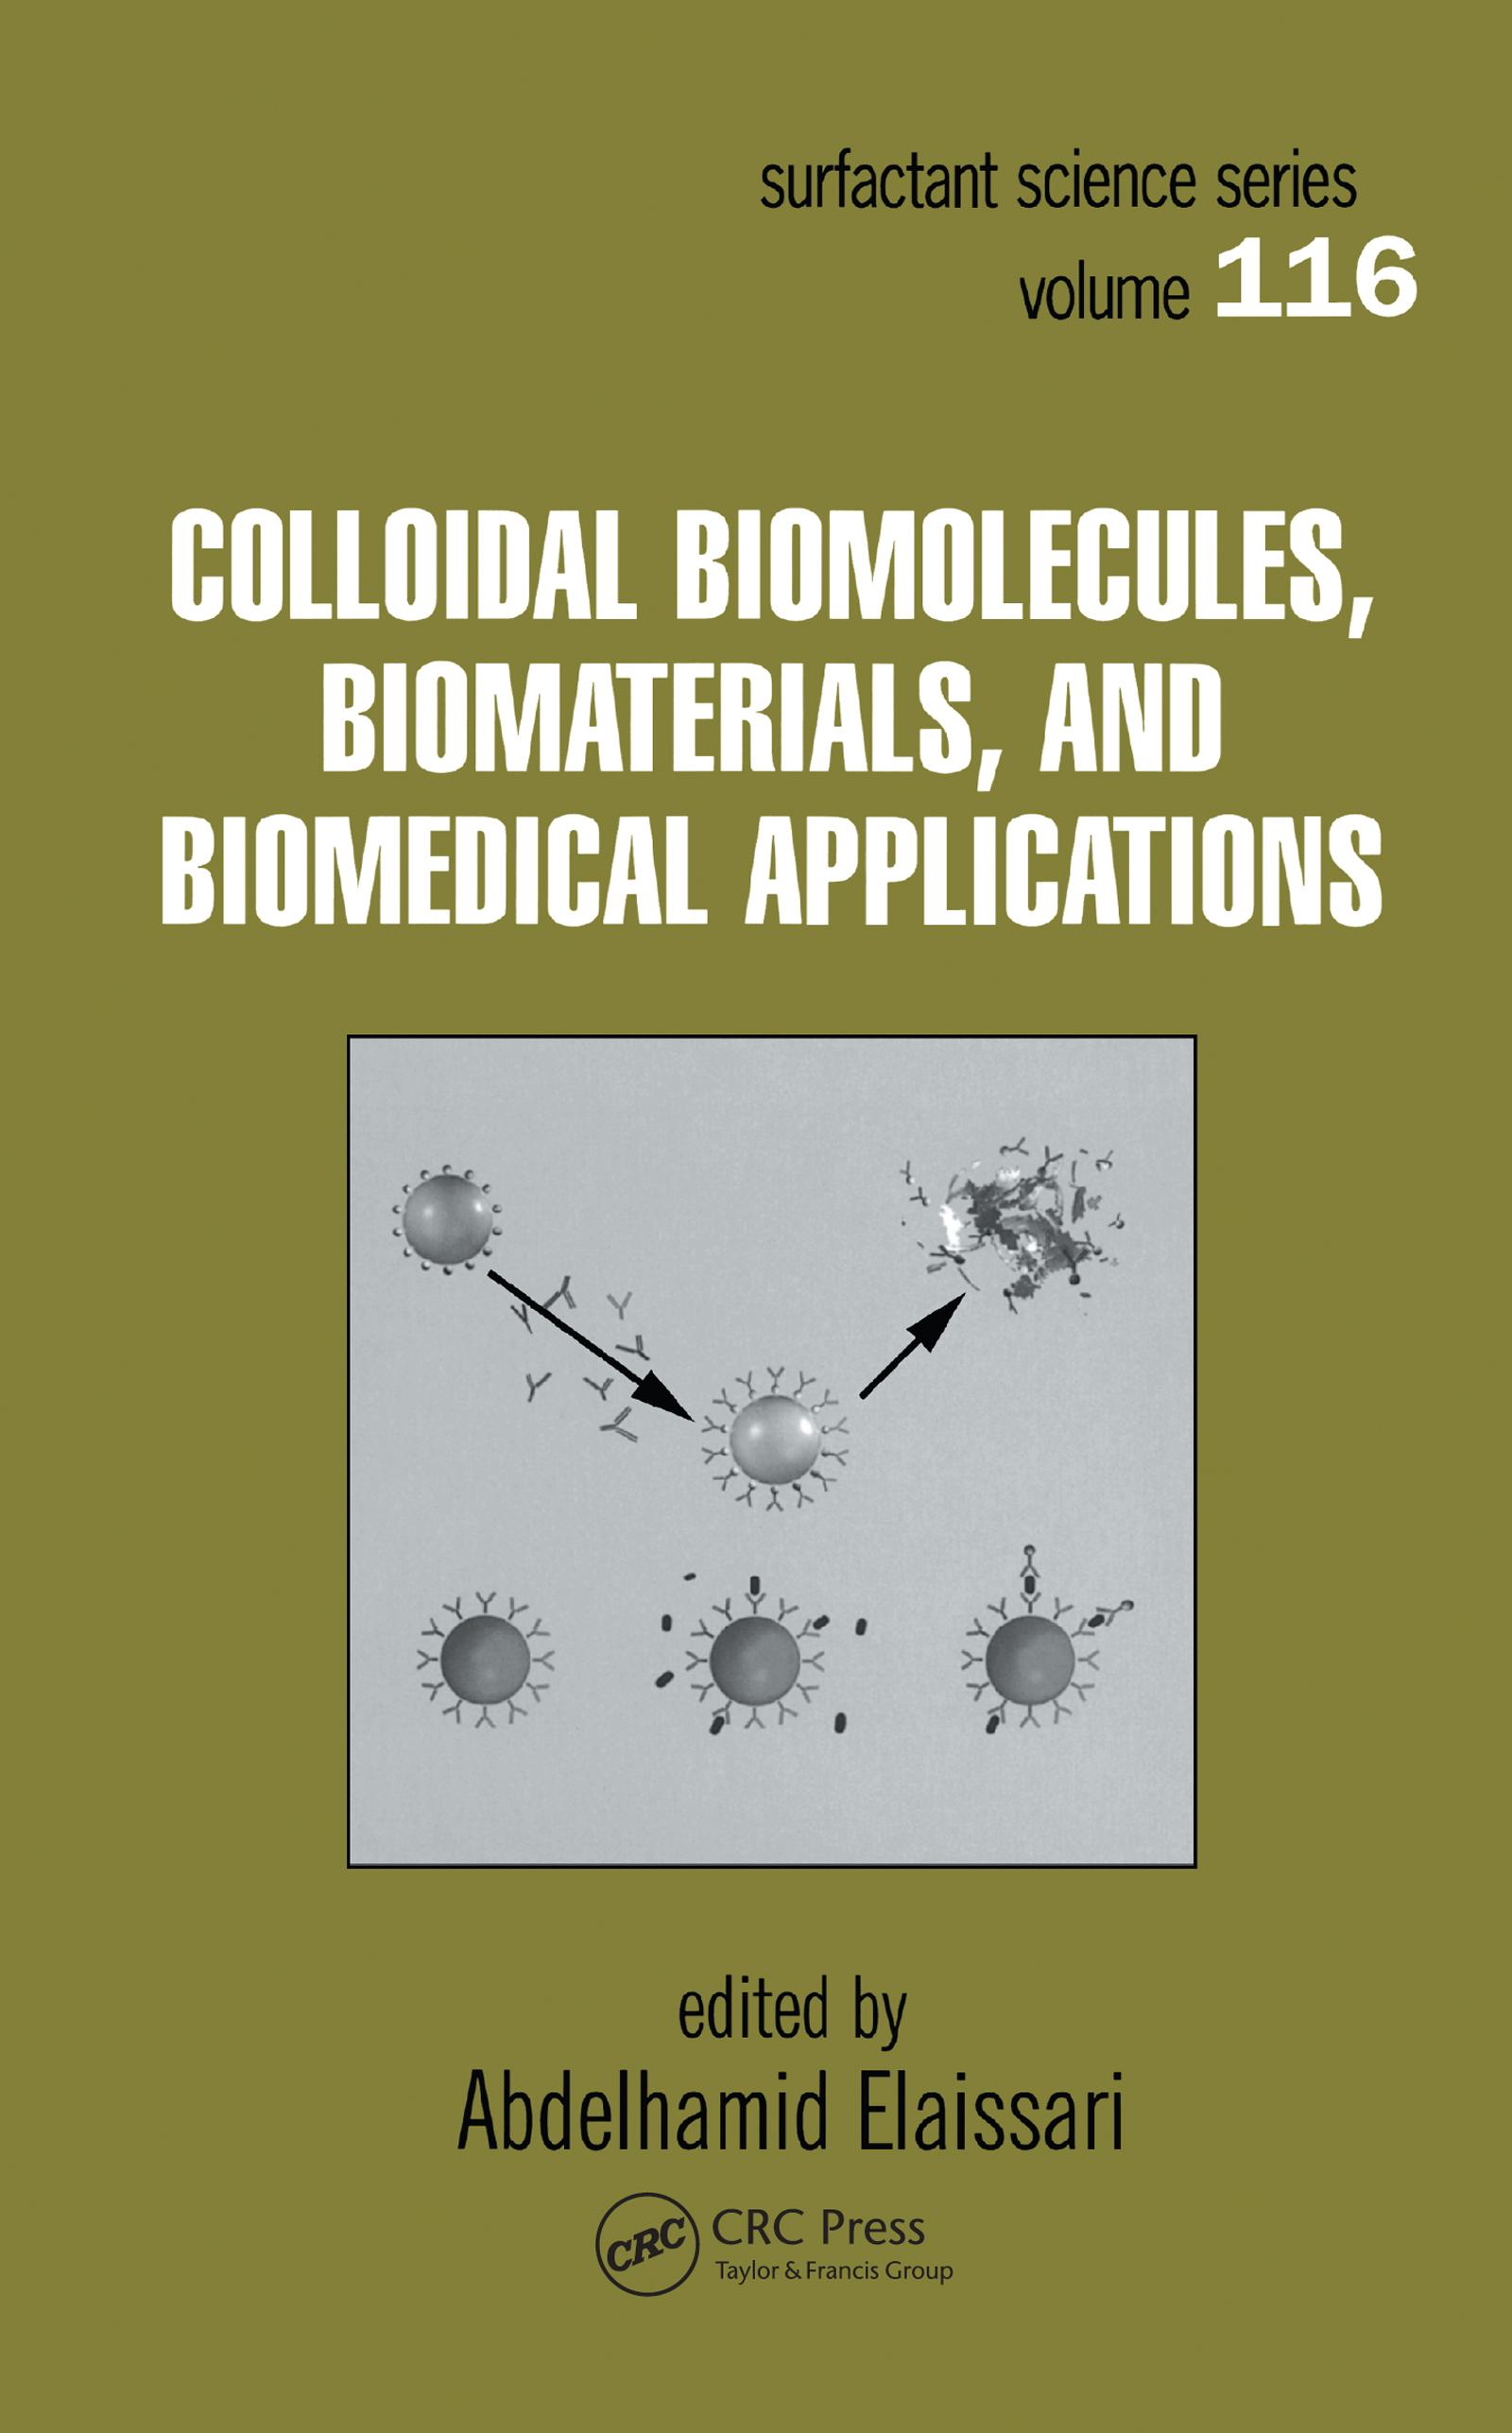 Colloidal Biomolecules, Biomaterials, and Biomedical Applications